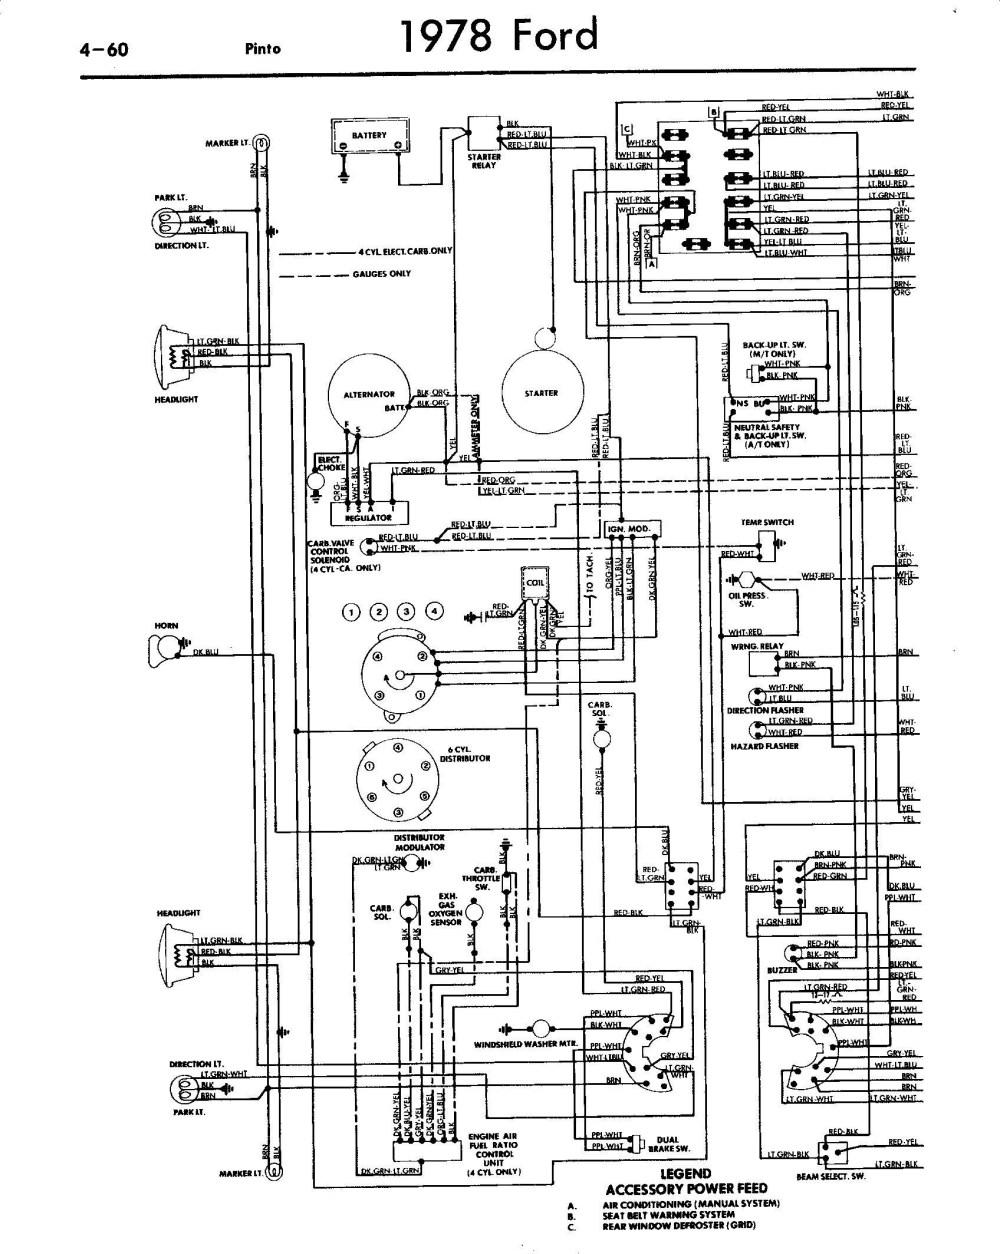 medium resolution of ford f250 engine diagram 01 7 3 engine wire diagram wiring info of ford f250